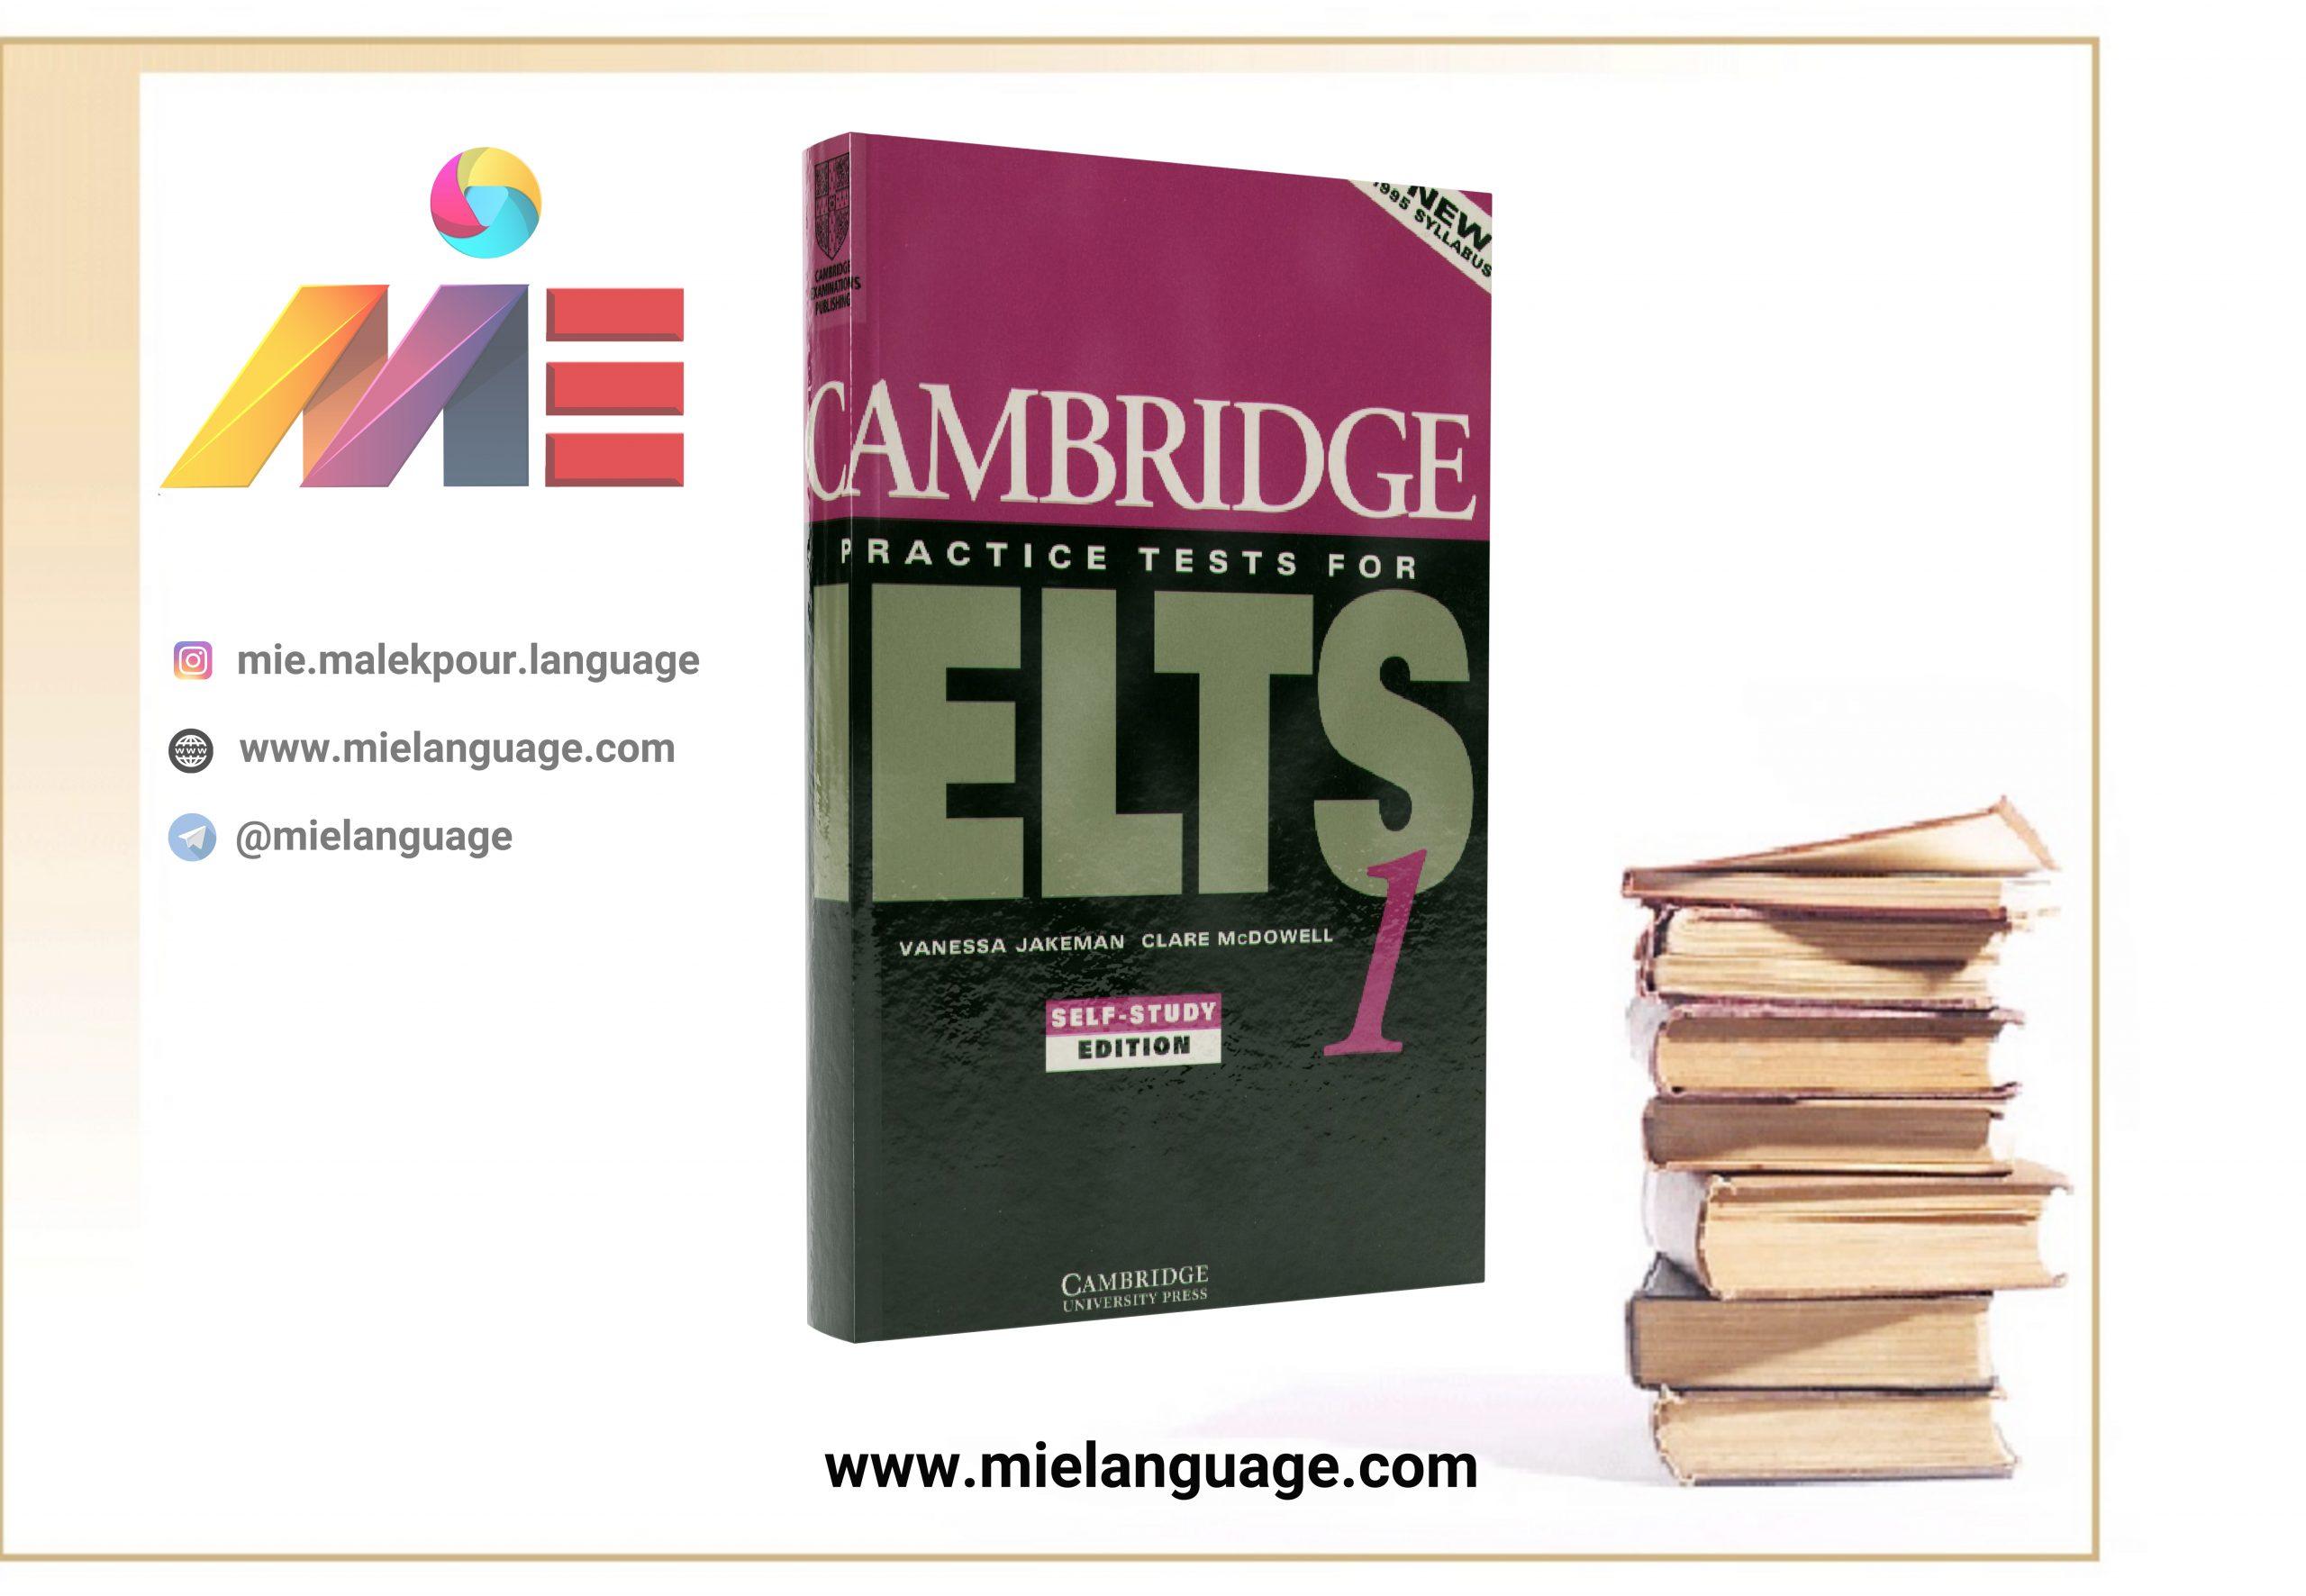 Cambridge Practice Tests for IELTS 01